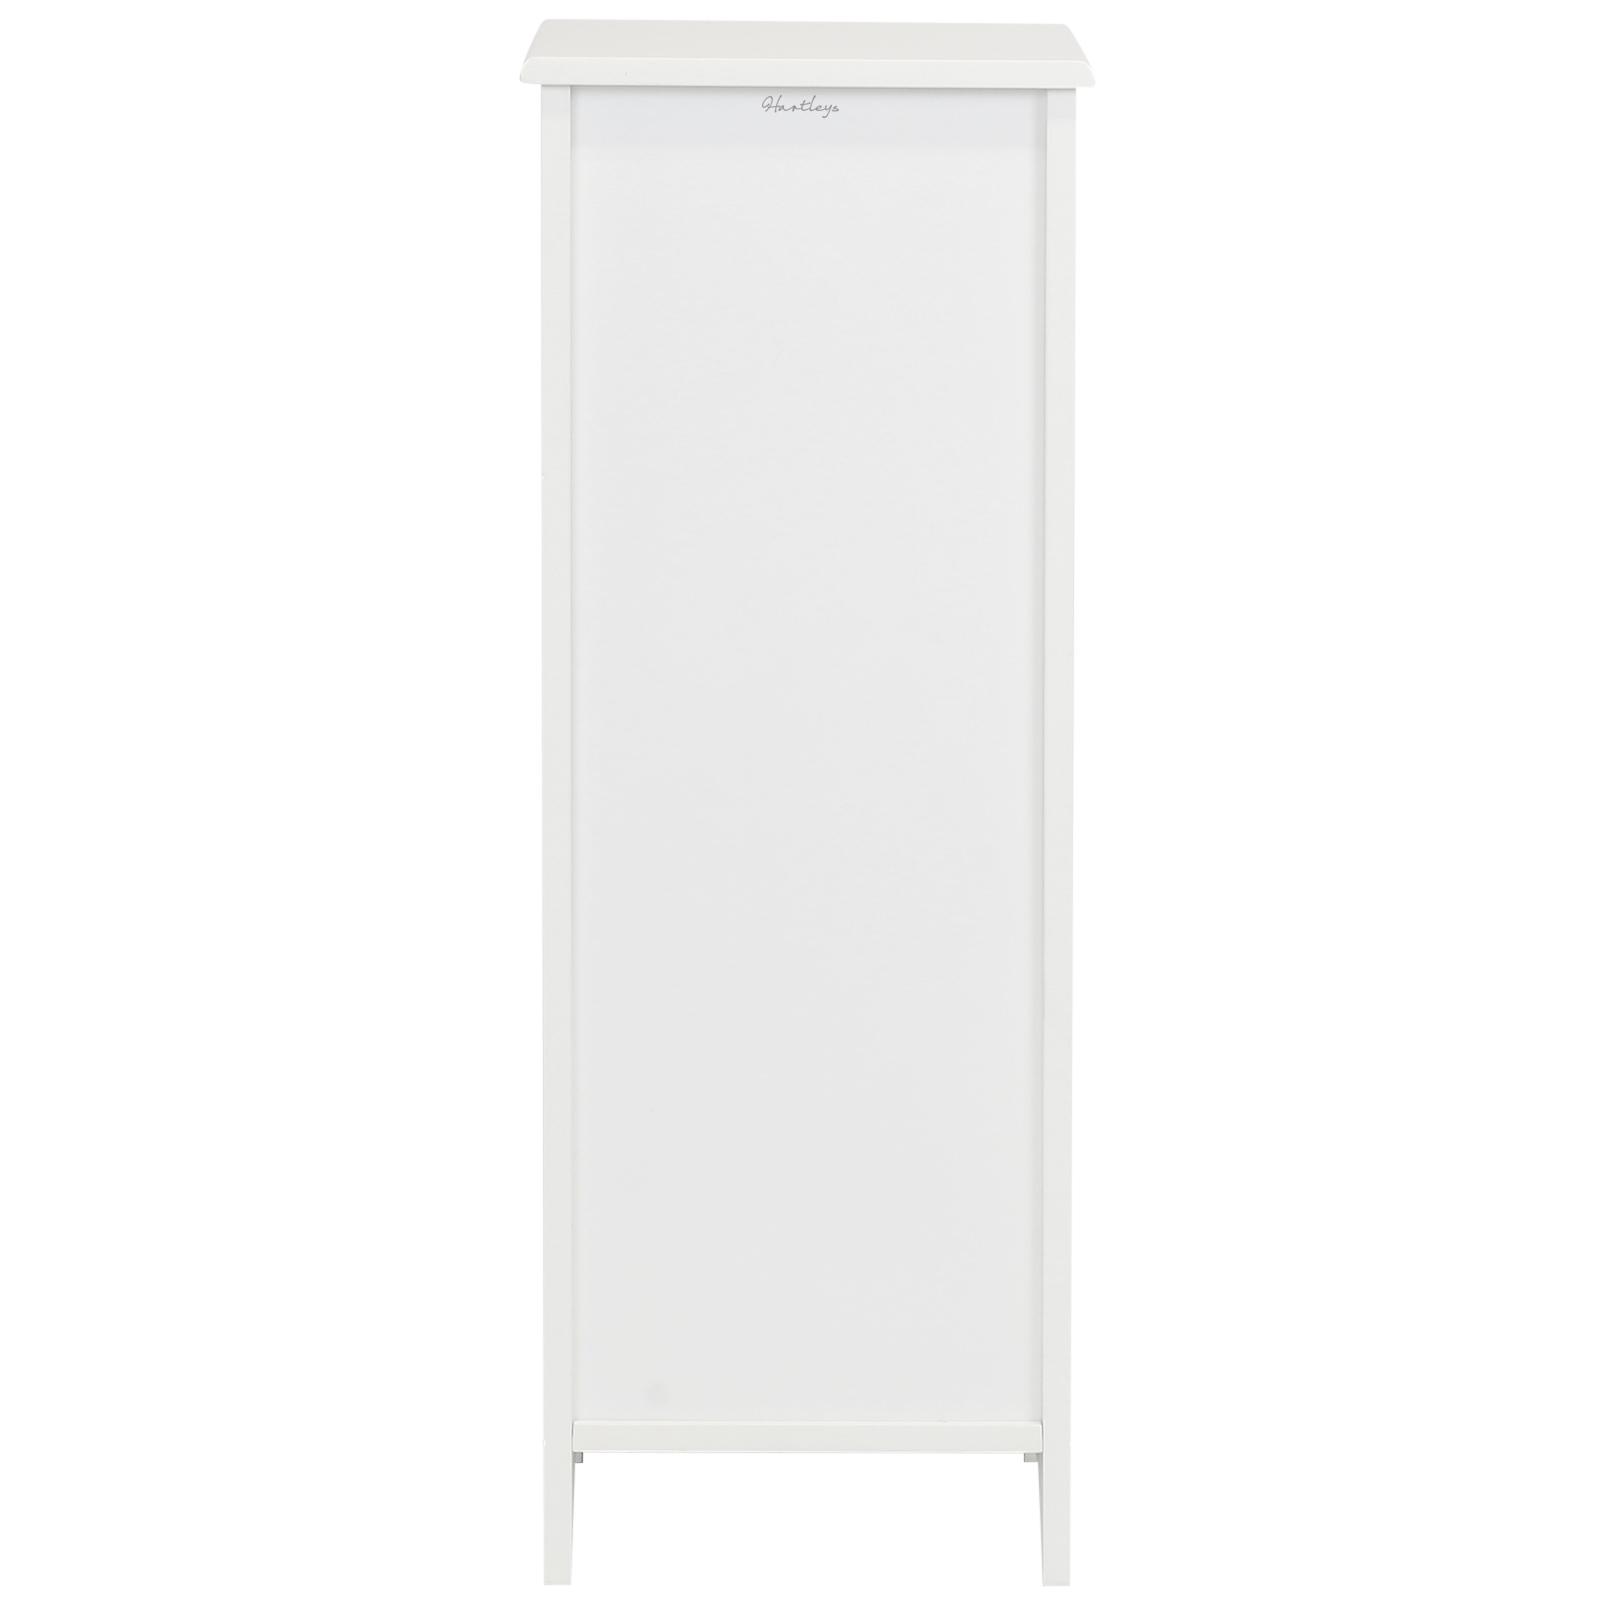 Damaged Kitchen Cabinets For Sale: SALE WHITE FREE STANDING 4 DRAWER SLIM BATHROOM CABINET